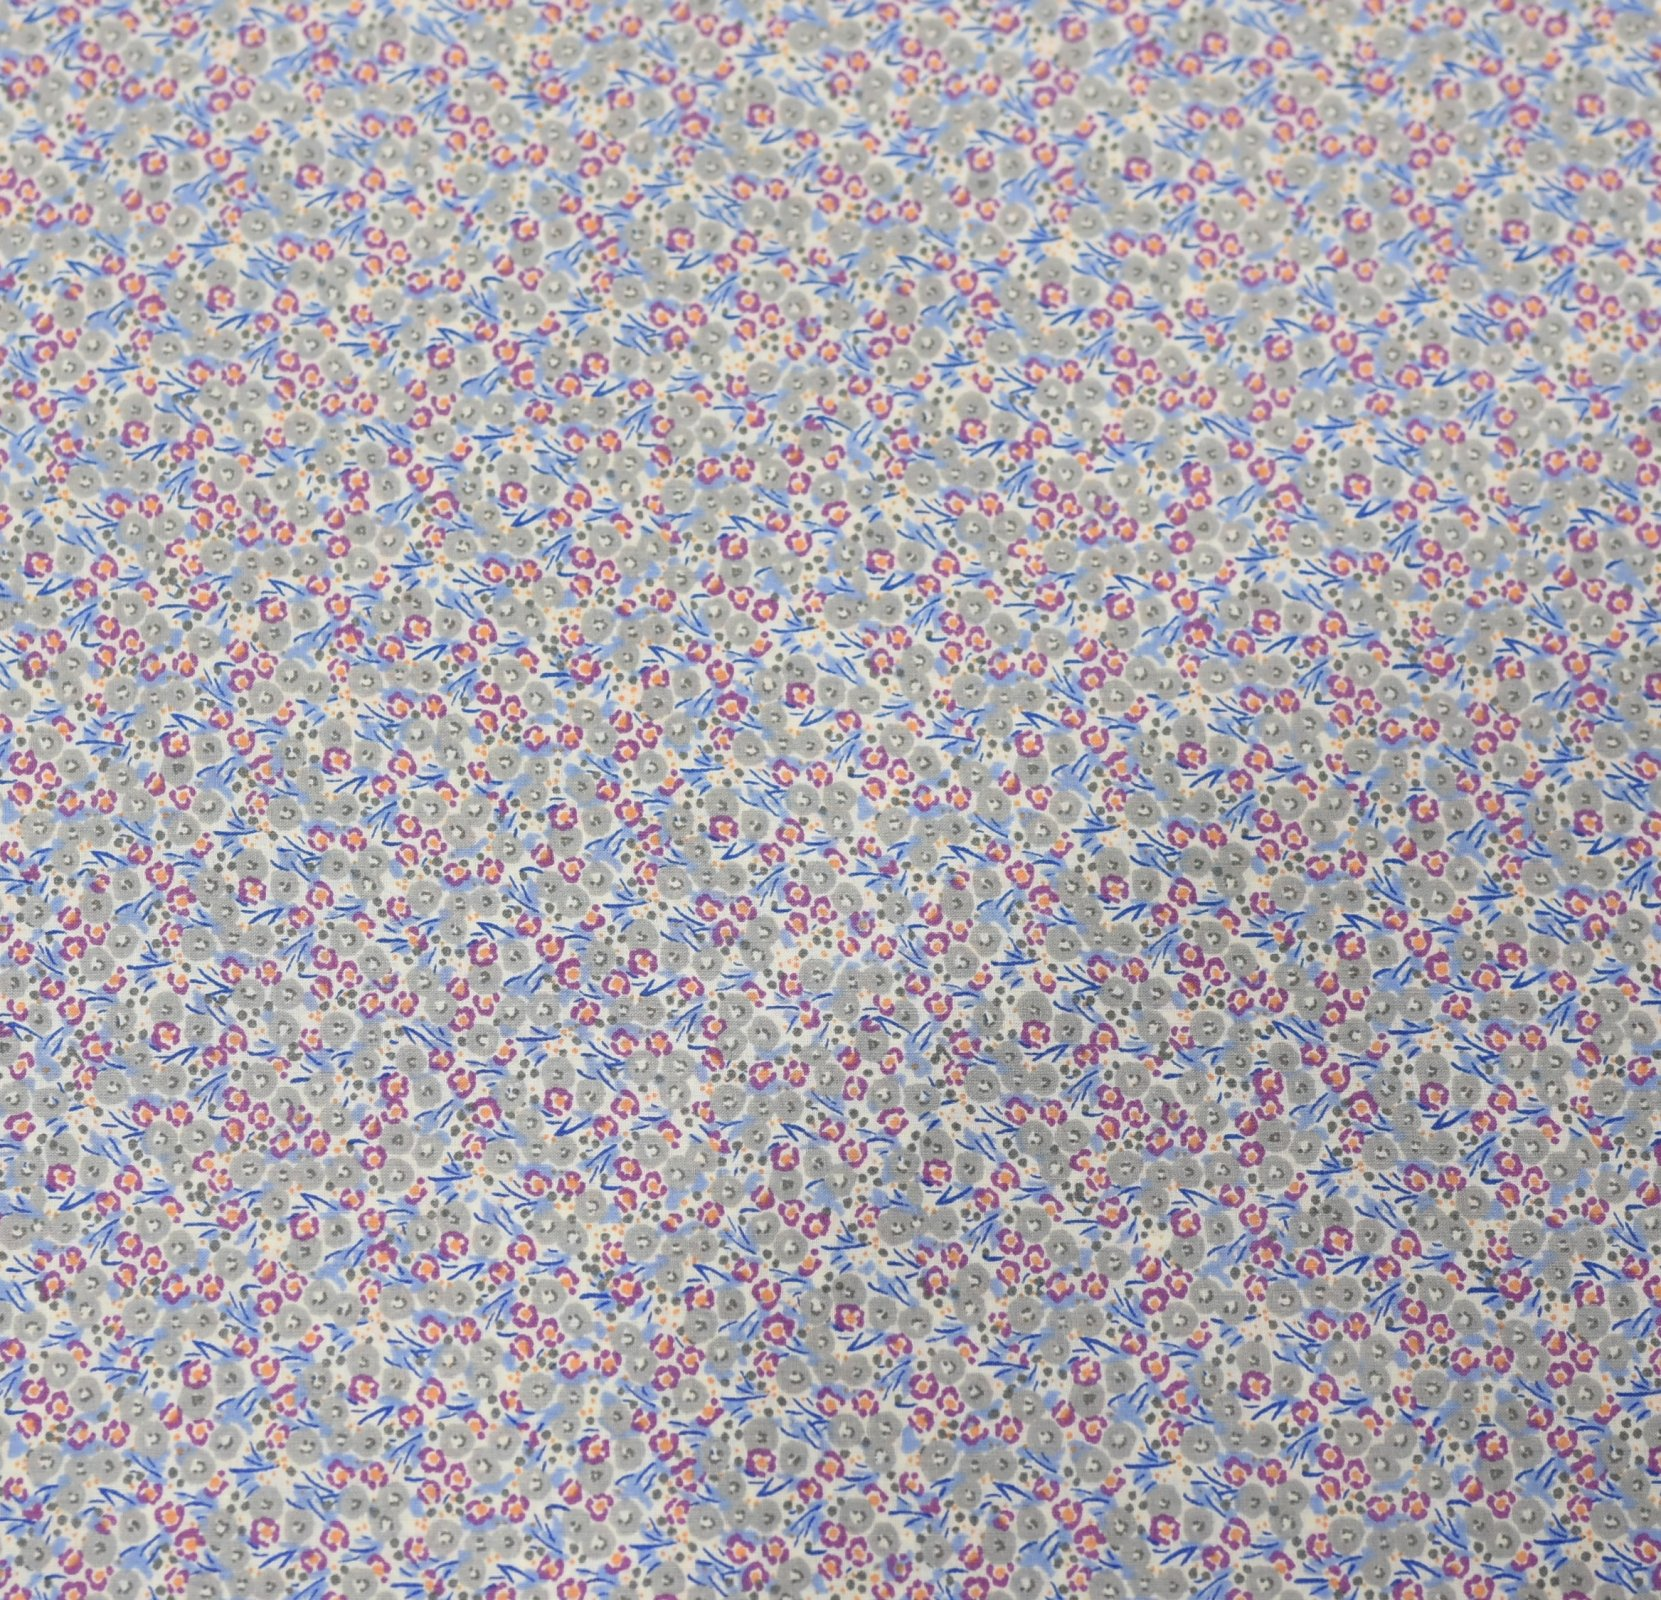 Hokkoh Fabric - Lawn Fabric - Ditsy Floral Grey